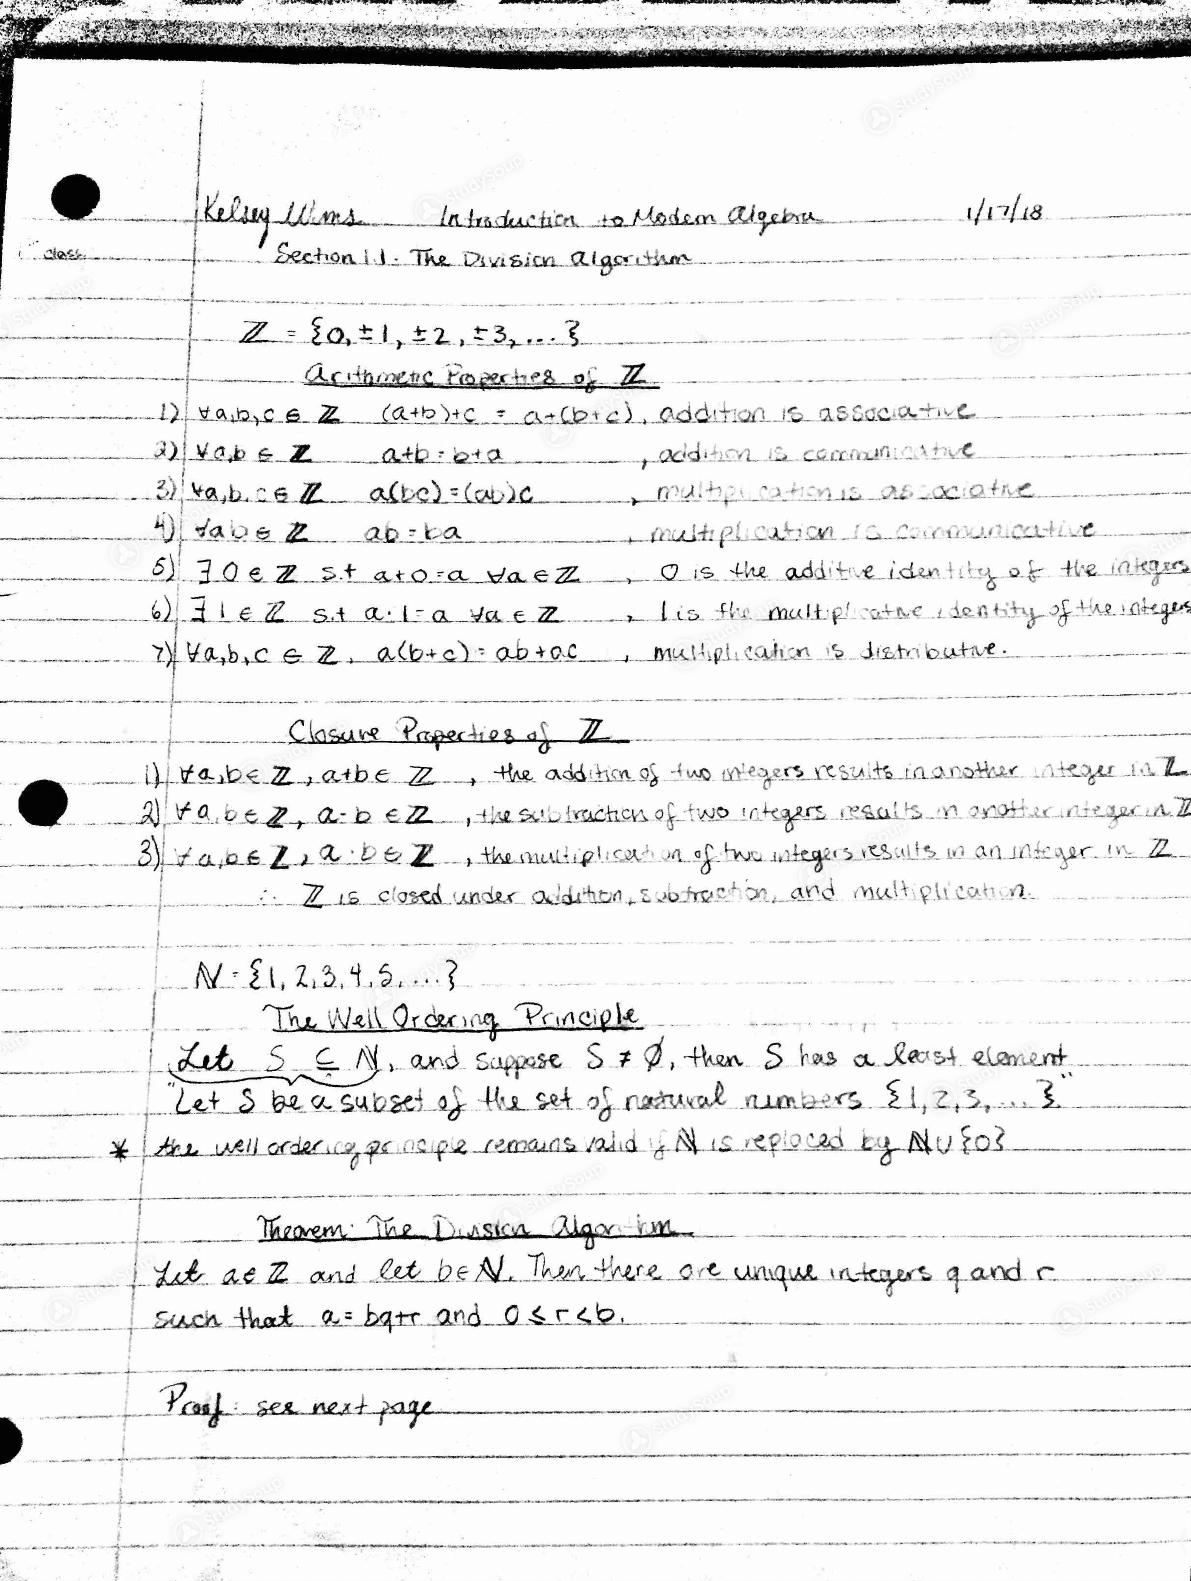 Temple - MATH 3096001 - Class Notes - Week 1 | StudySoup